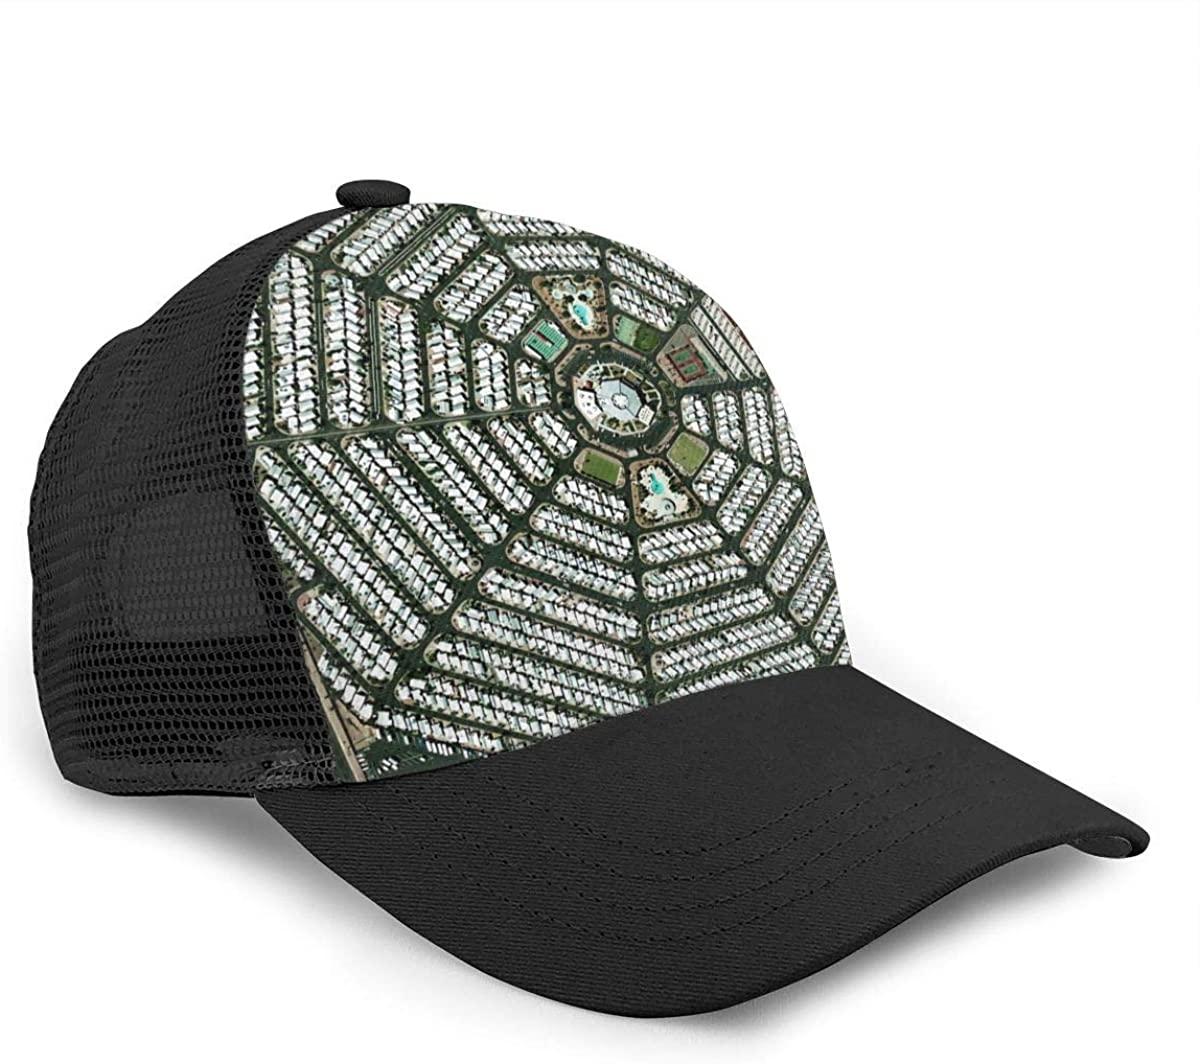 Unisex Adult Modoest Mouse Casual Sports Baseball Cap Asjustable Hip Hop Classic Sun Hats Black